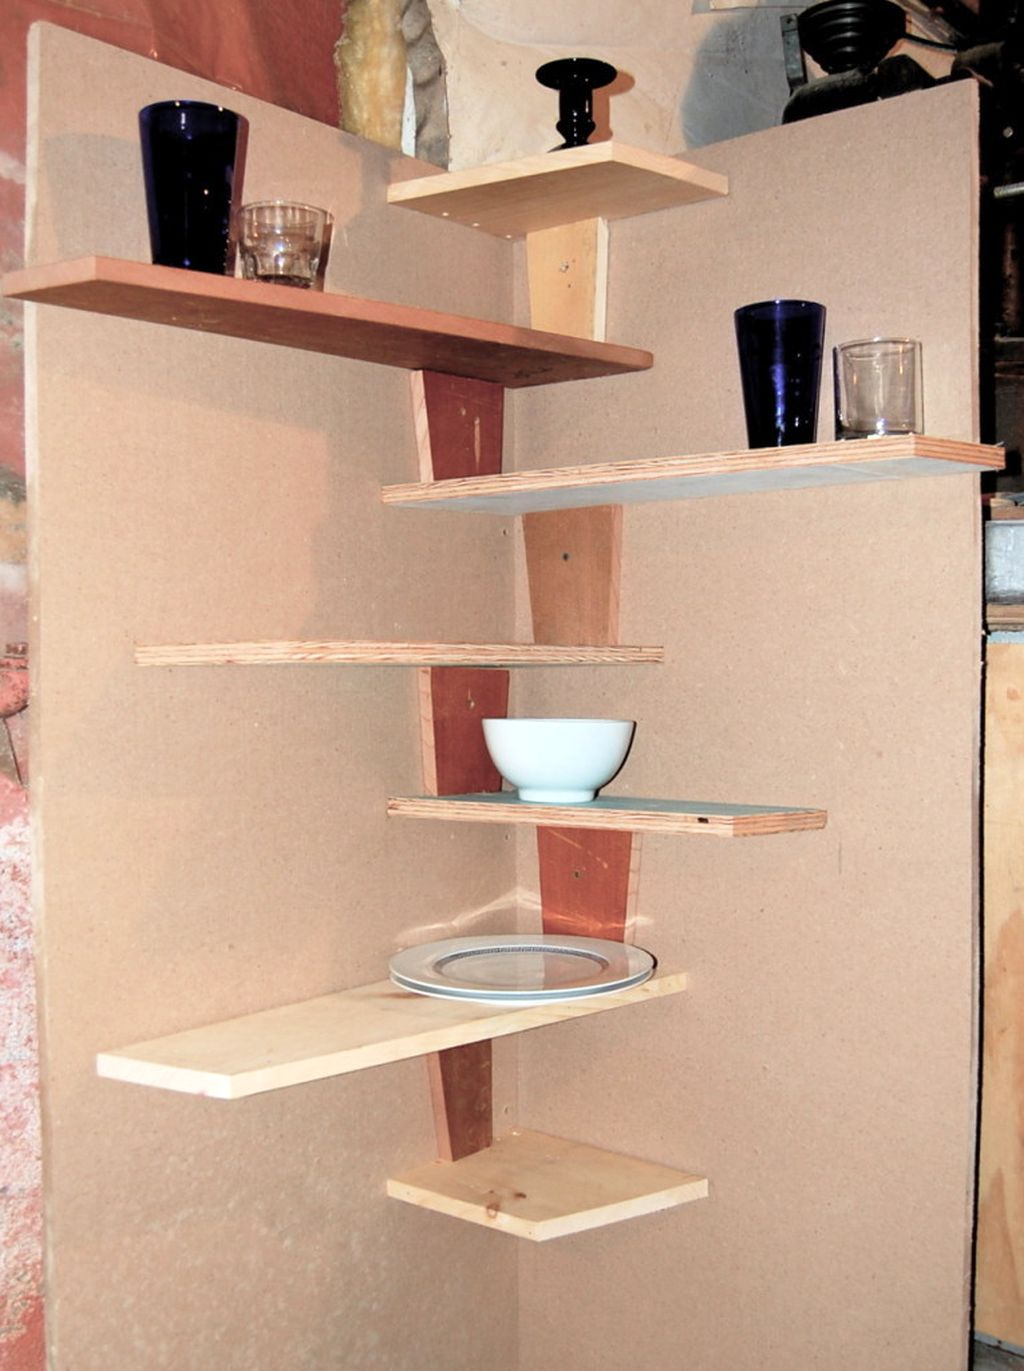 20 Great Inspirations Of Small Corner Shelving Unit